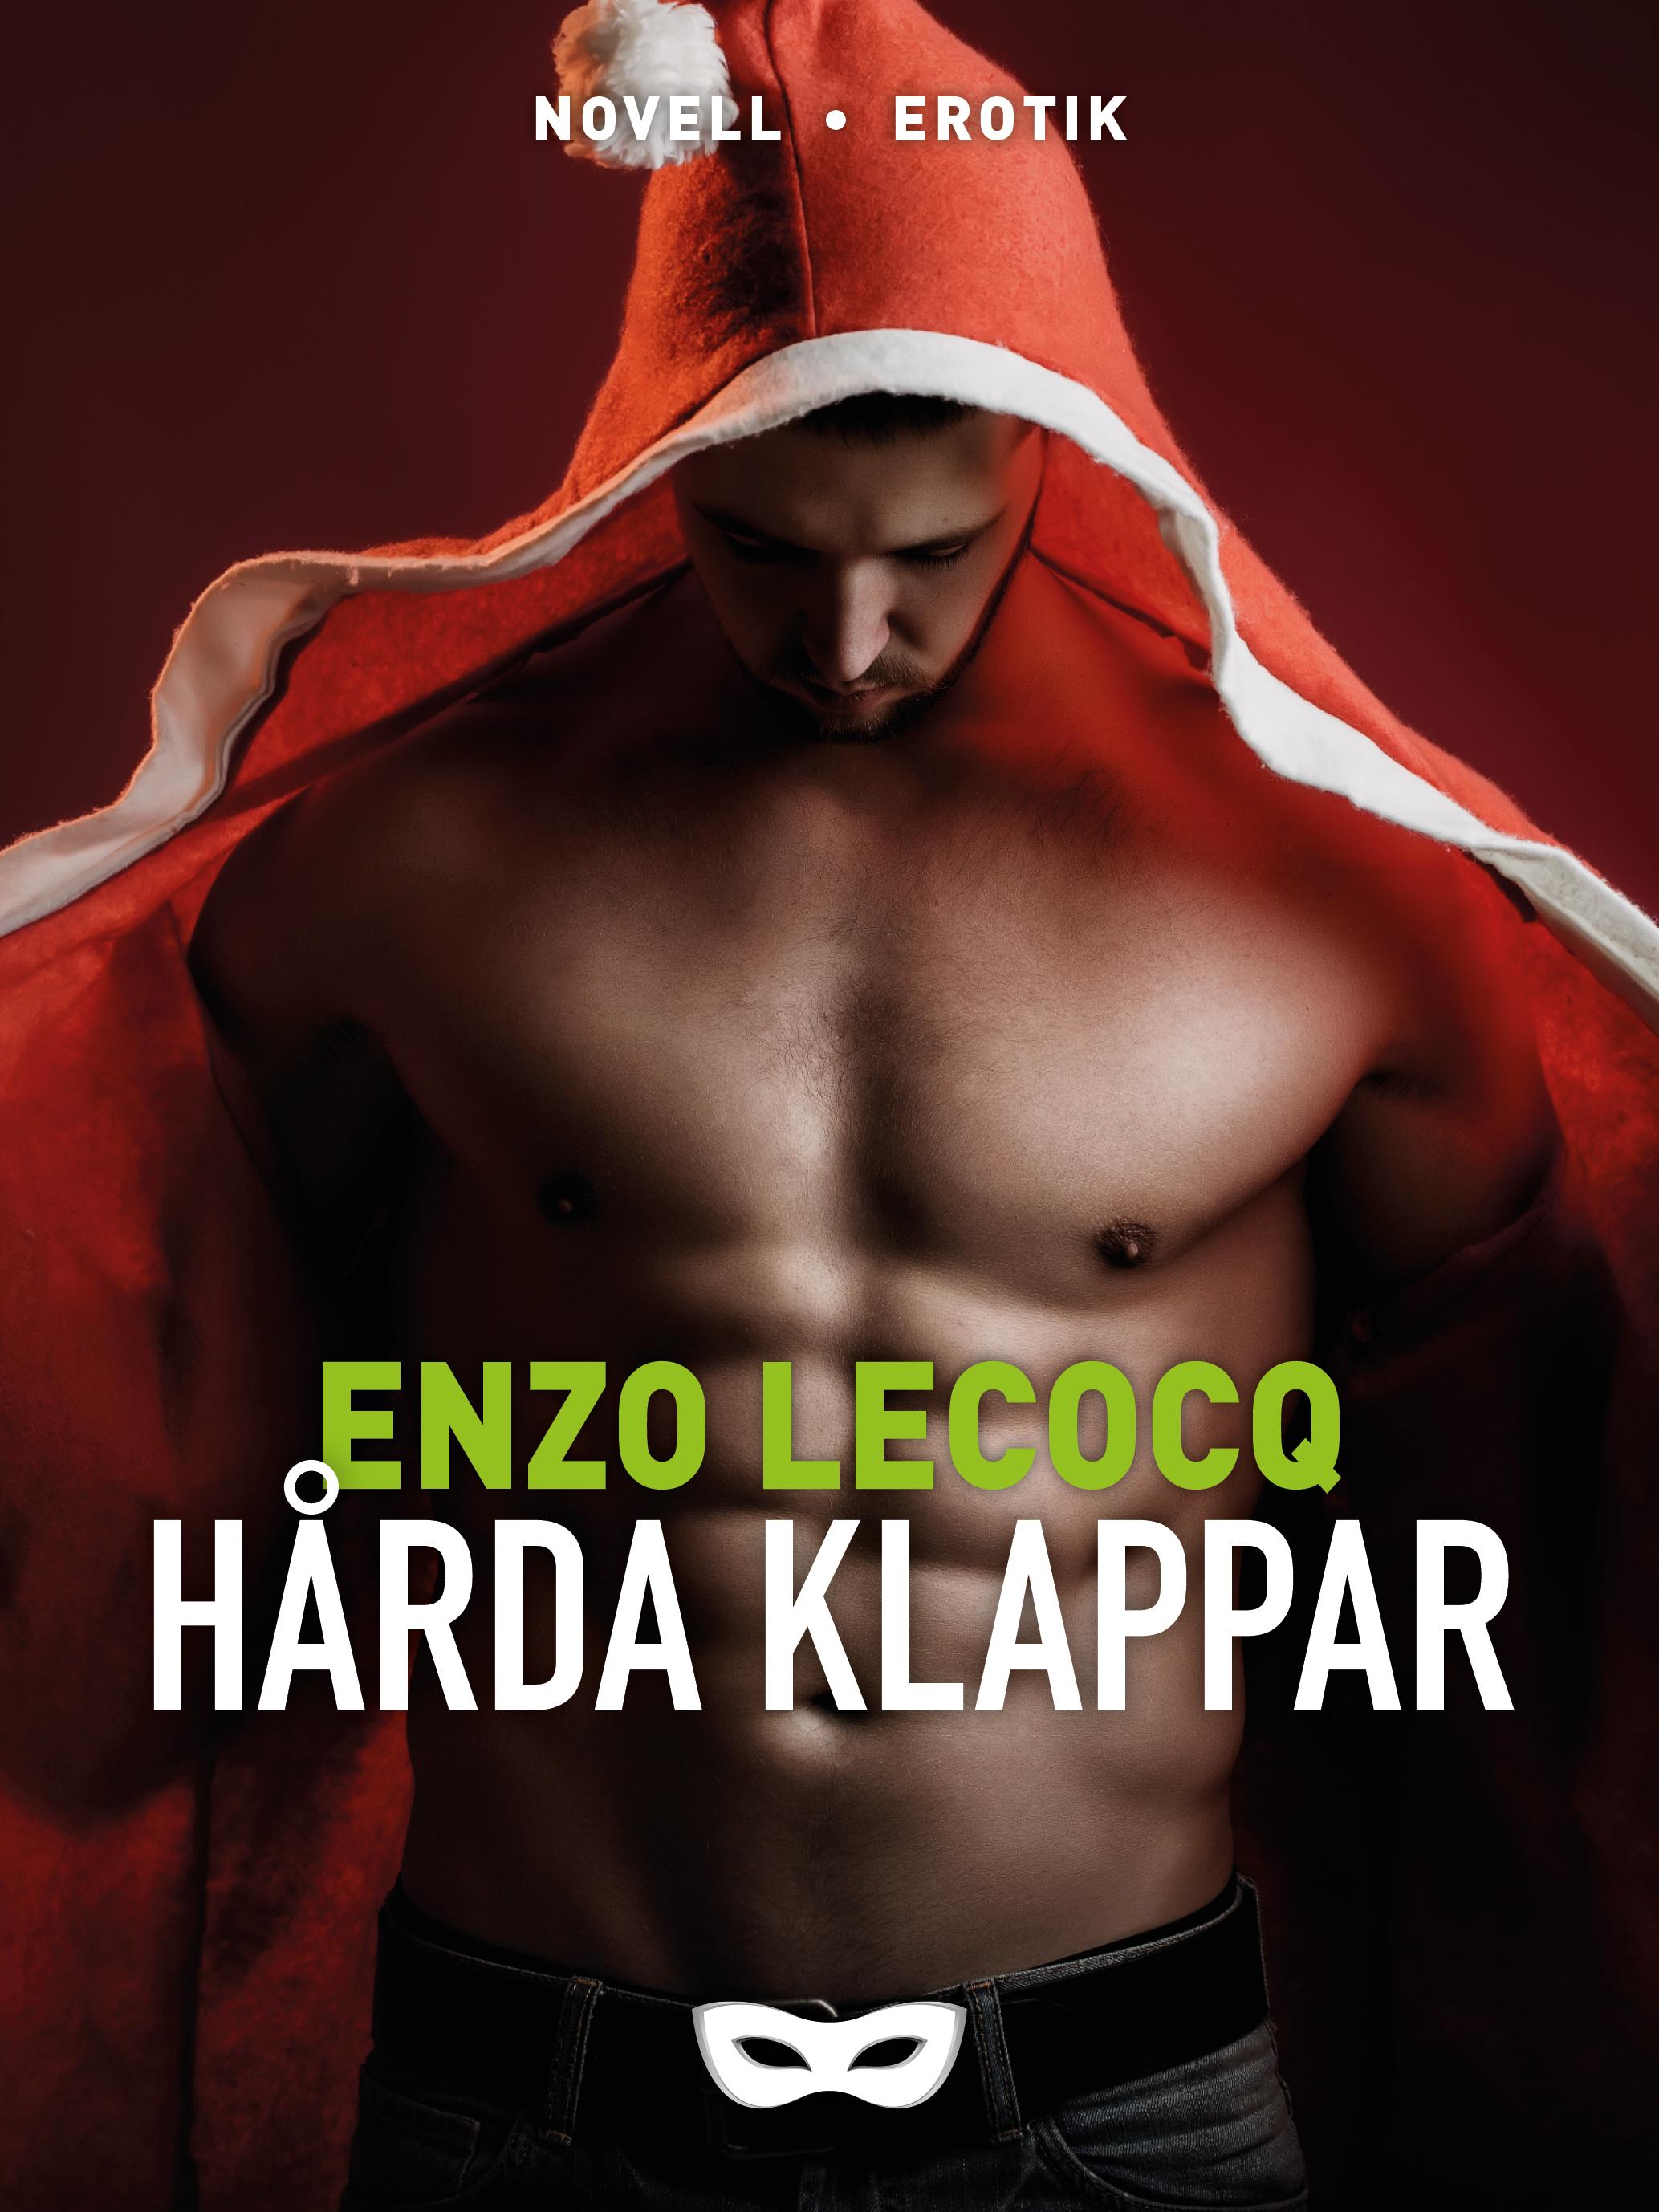 JUL-n_Harda klappar_Enzo Lecocq.jpg